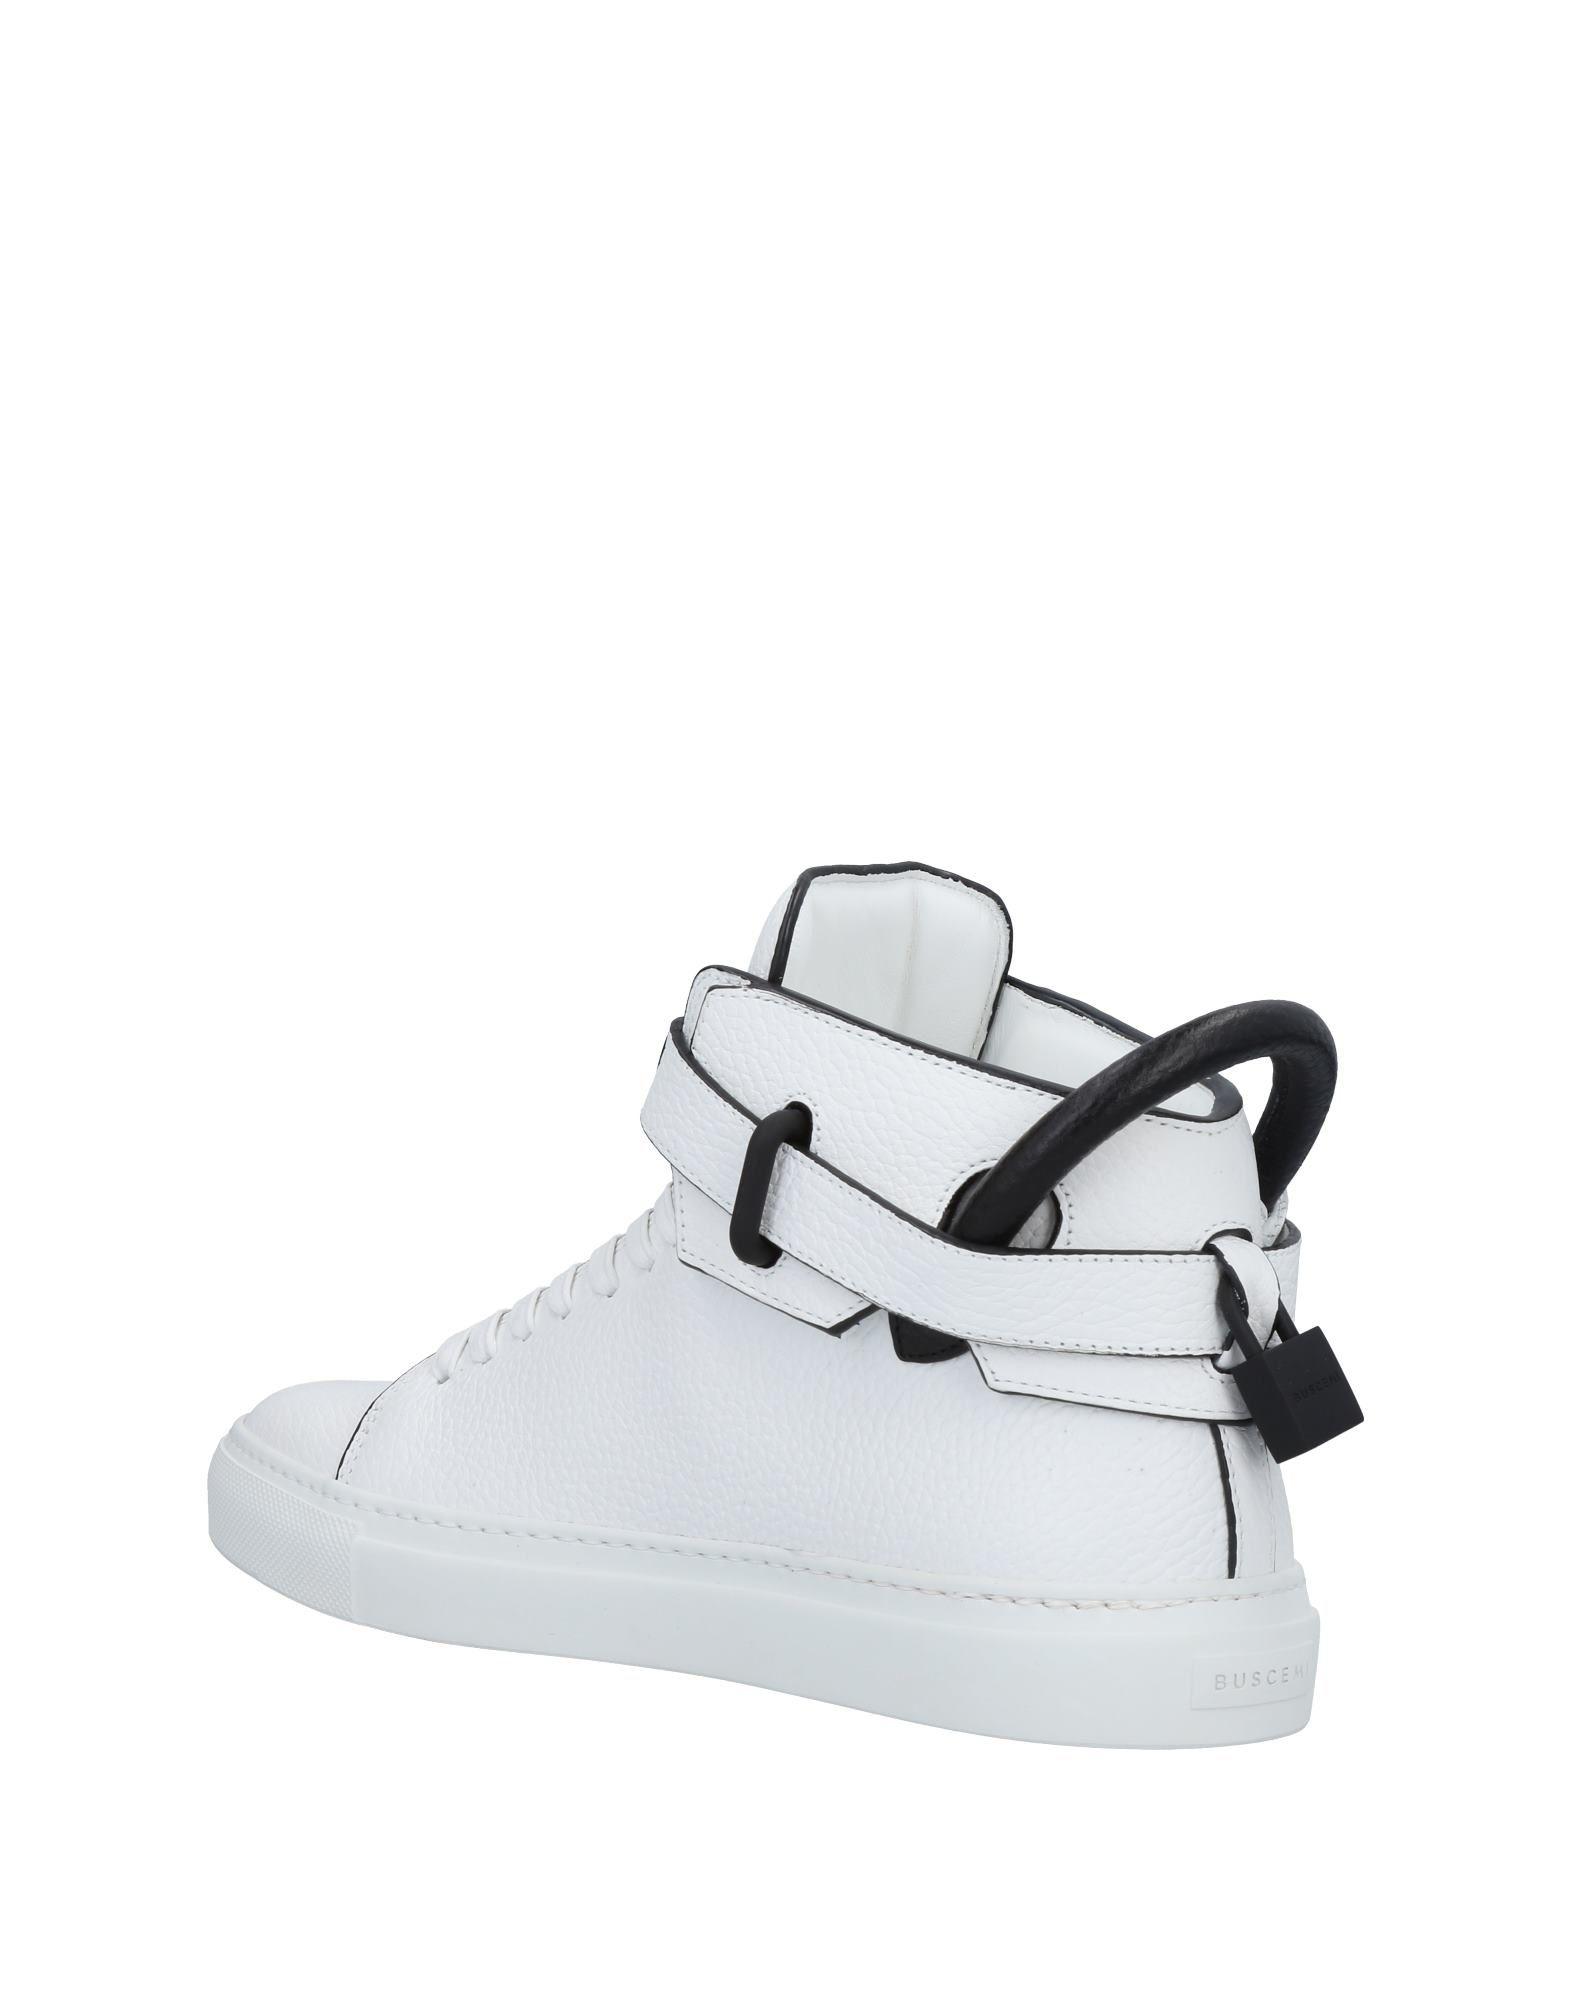 Buscemi Sneakers Heiße Herren  11471328QF Heiße Sneakers Schuhe c78f01